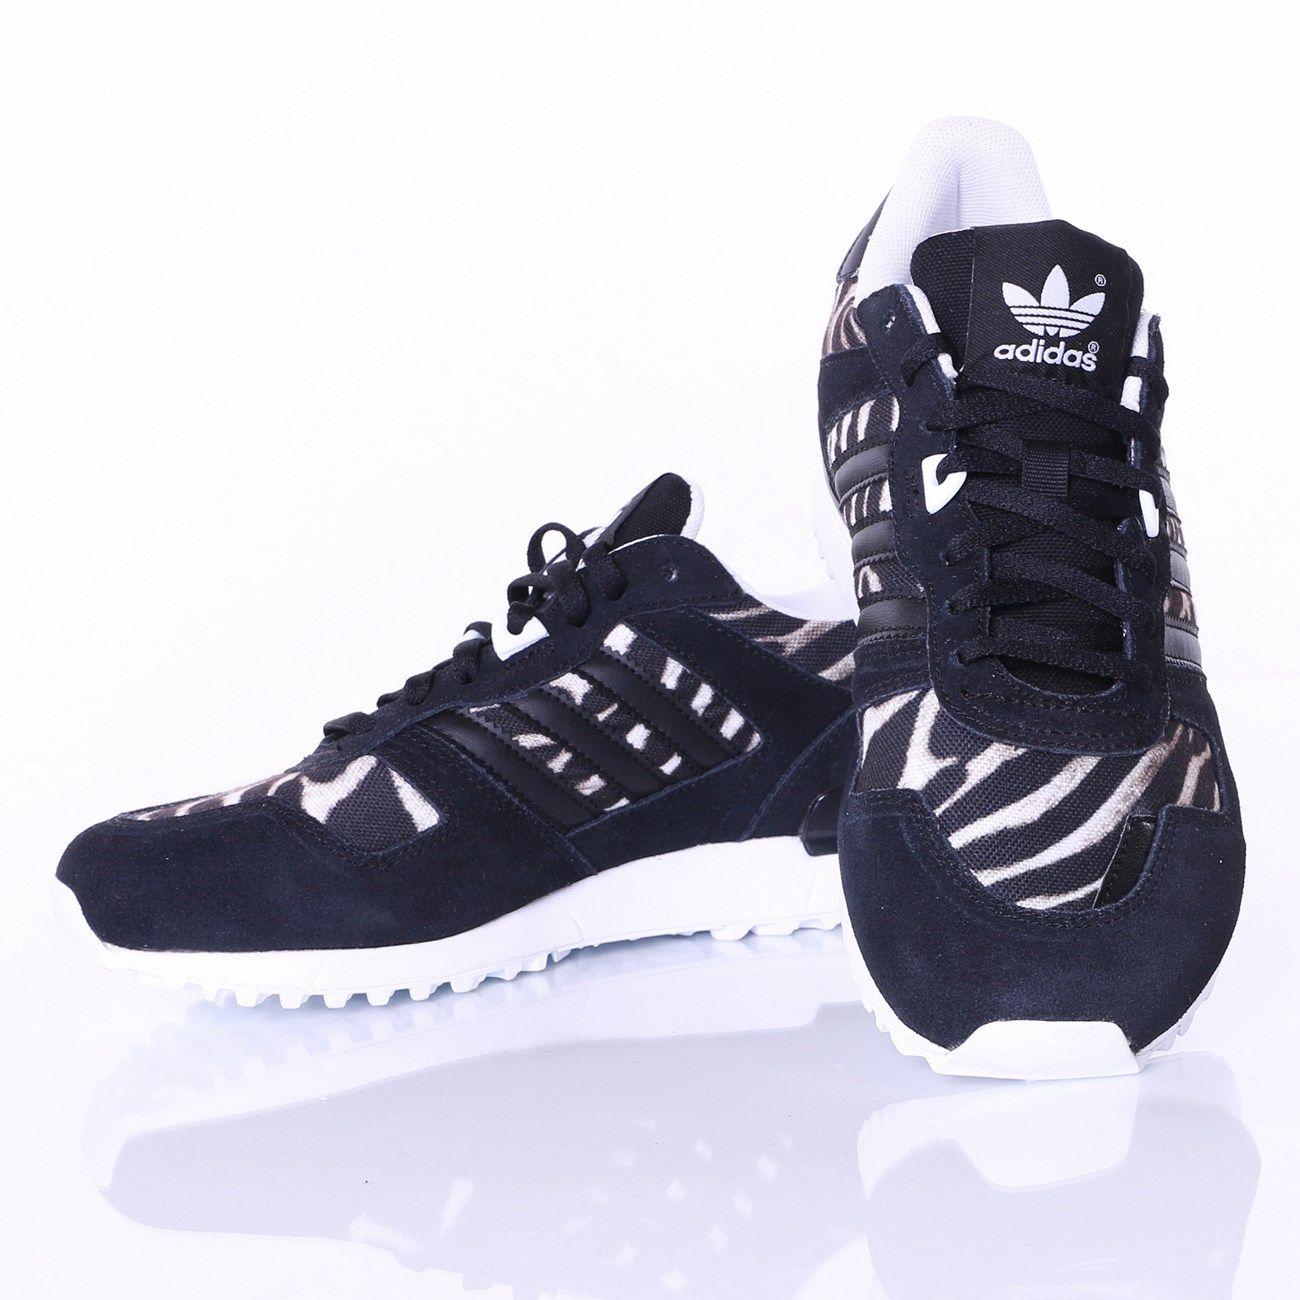 usa adidas zx 700 zebre 0aa46 0febf